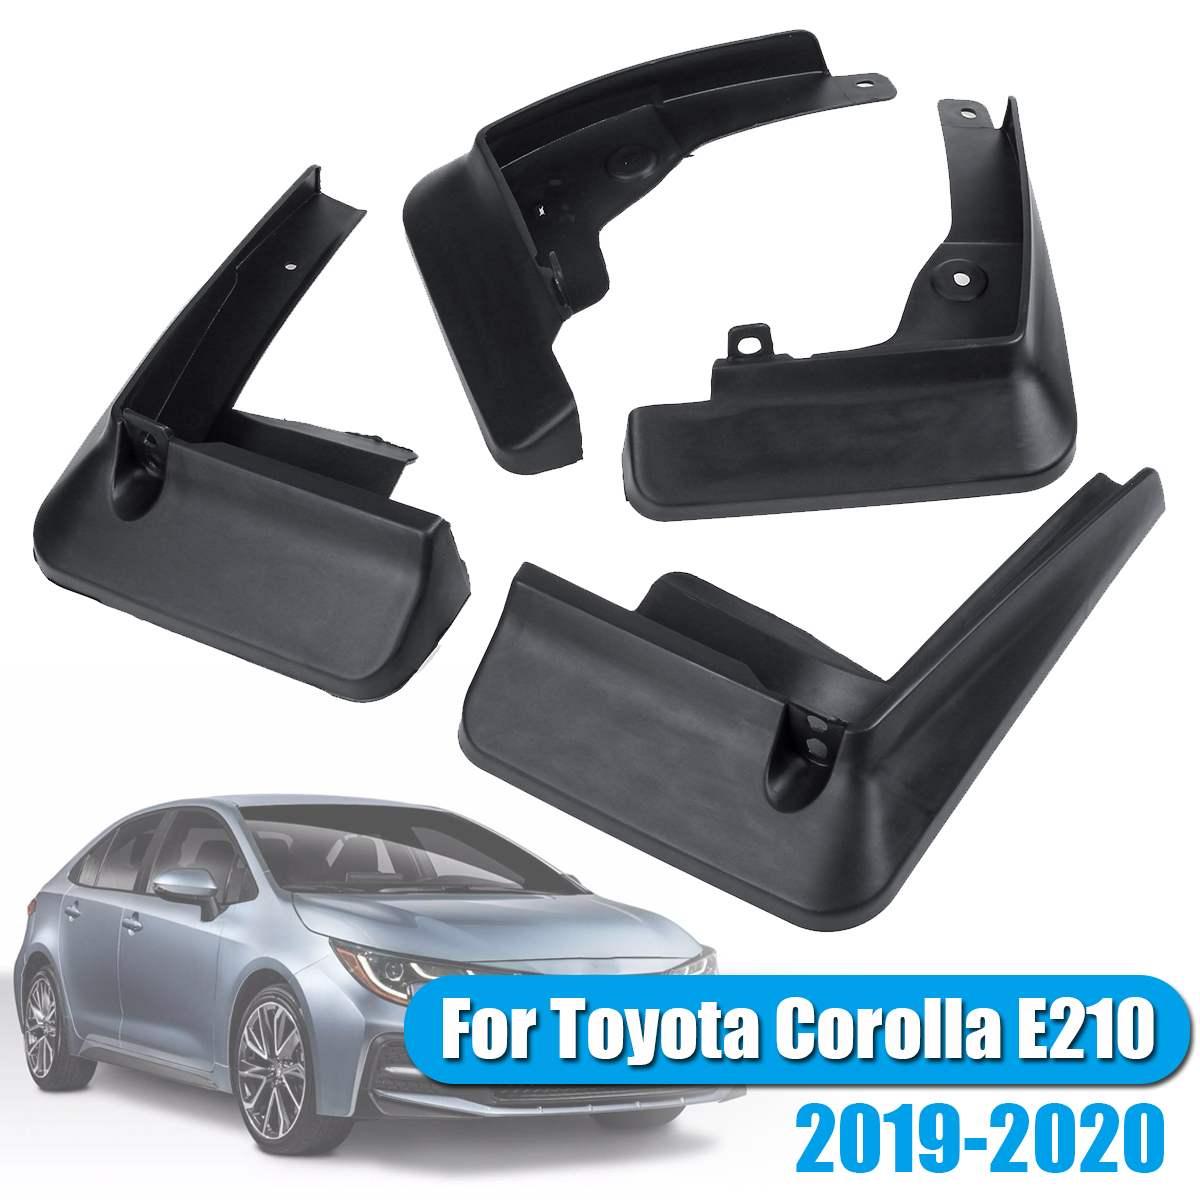 Nuevo 4 unids/set negro PP guardabarros delanteros traseros guardabarros para Toyota Corolla E210 2019-2020